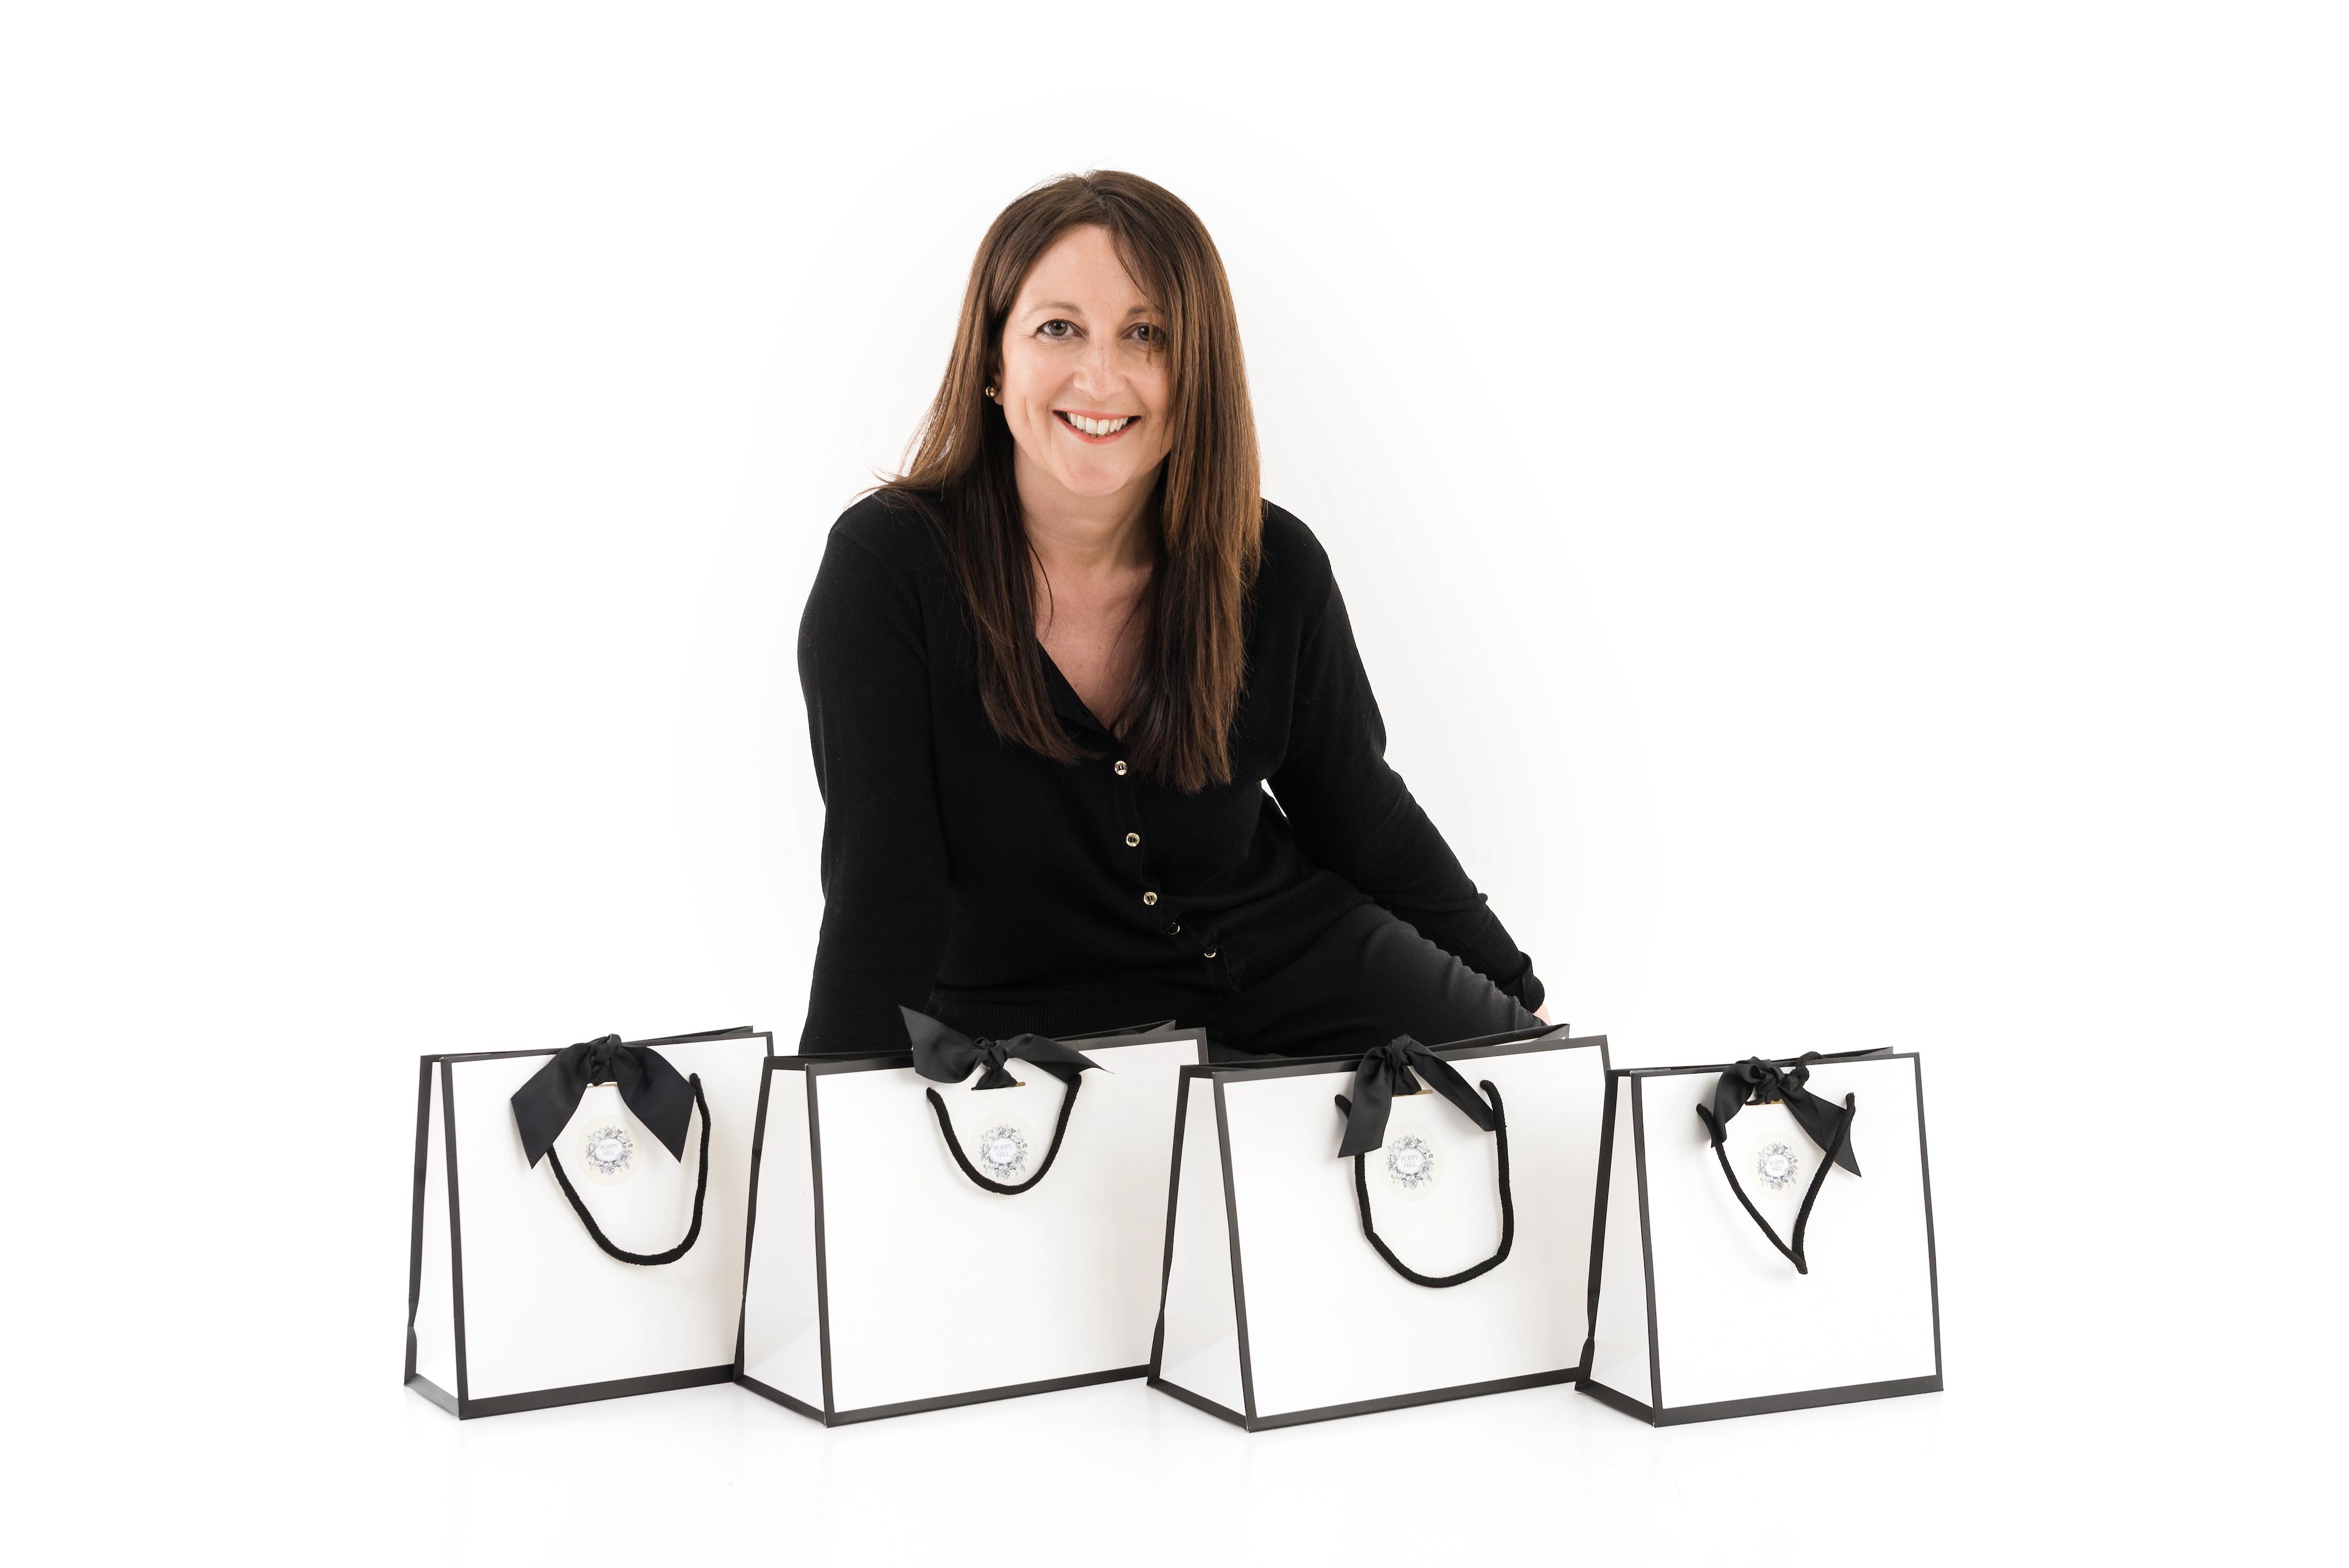 Poppy Hill Bags Business Boost in Lockdown